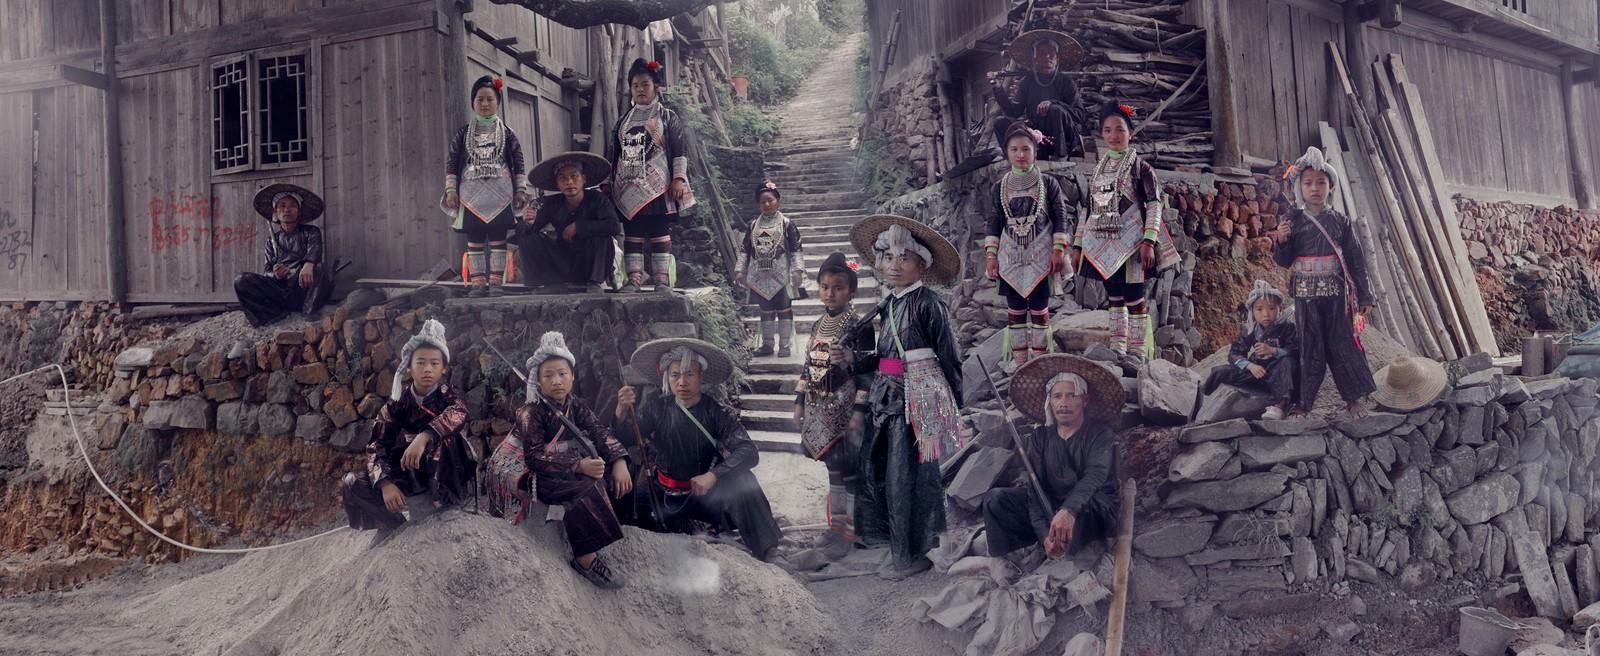 Basha Miao-landsby i Kina.